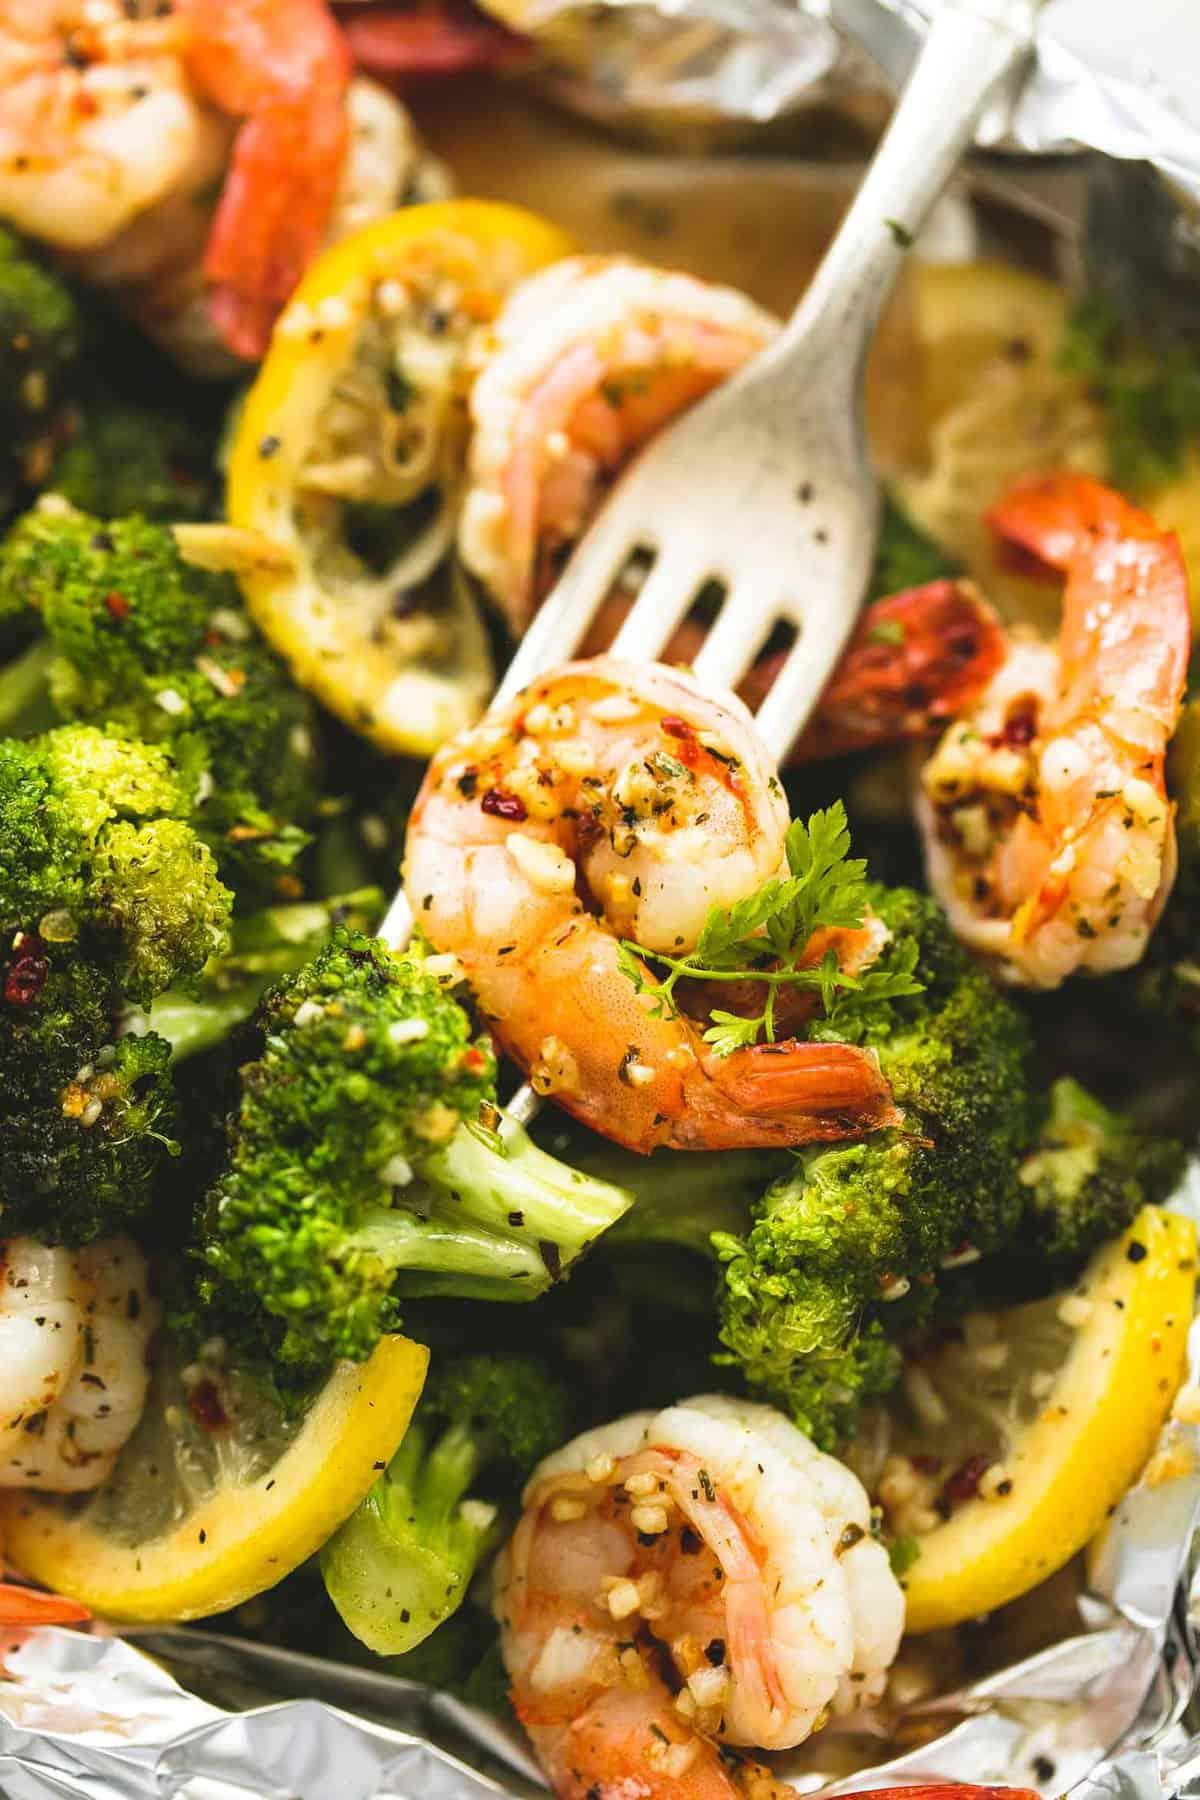 Lemon Herb Shrimp and Broccoli Foil Packs | lecremedelacrumb.com